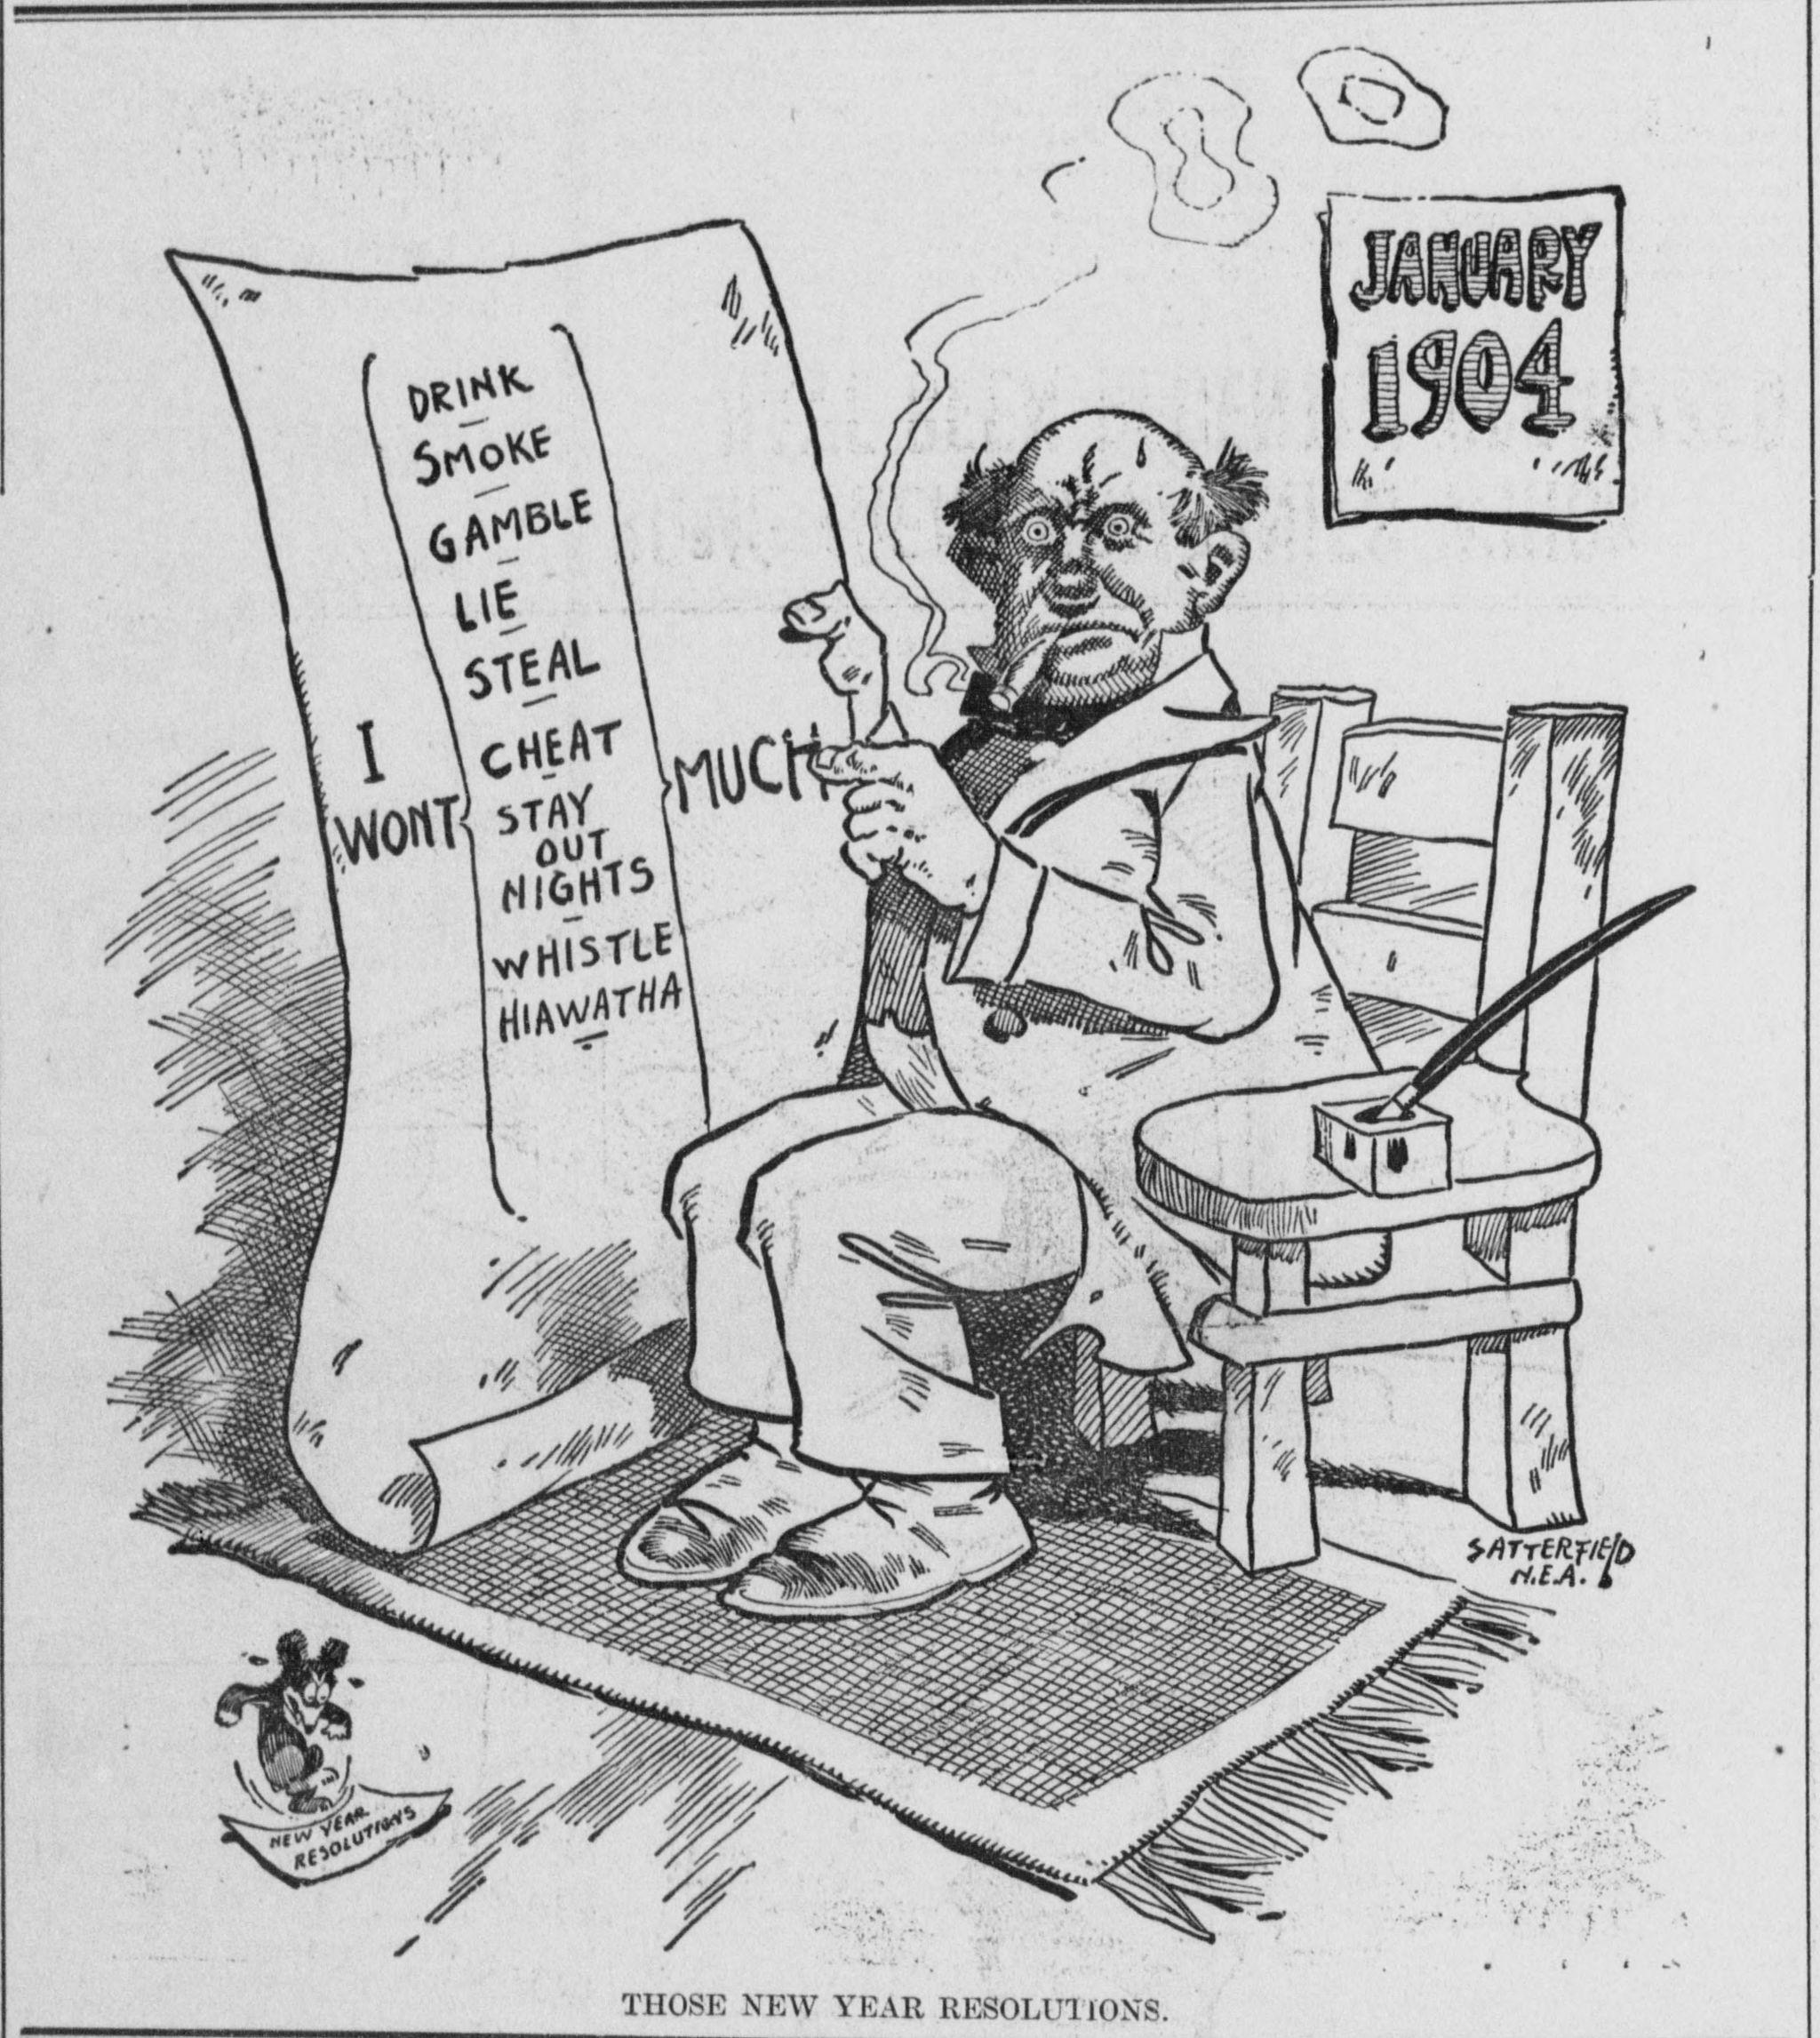 satterfield_cartoon_on_new_years_resolutions_1904